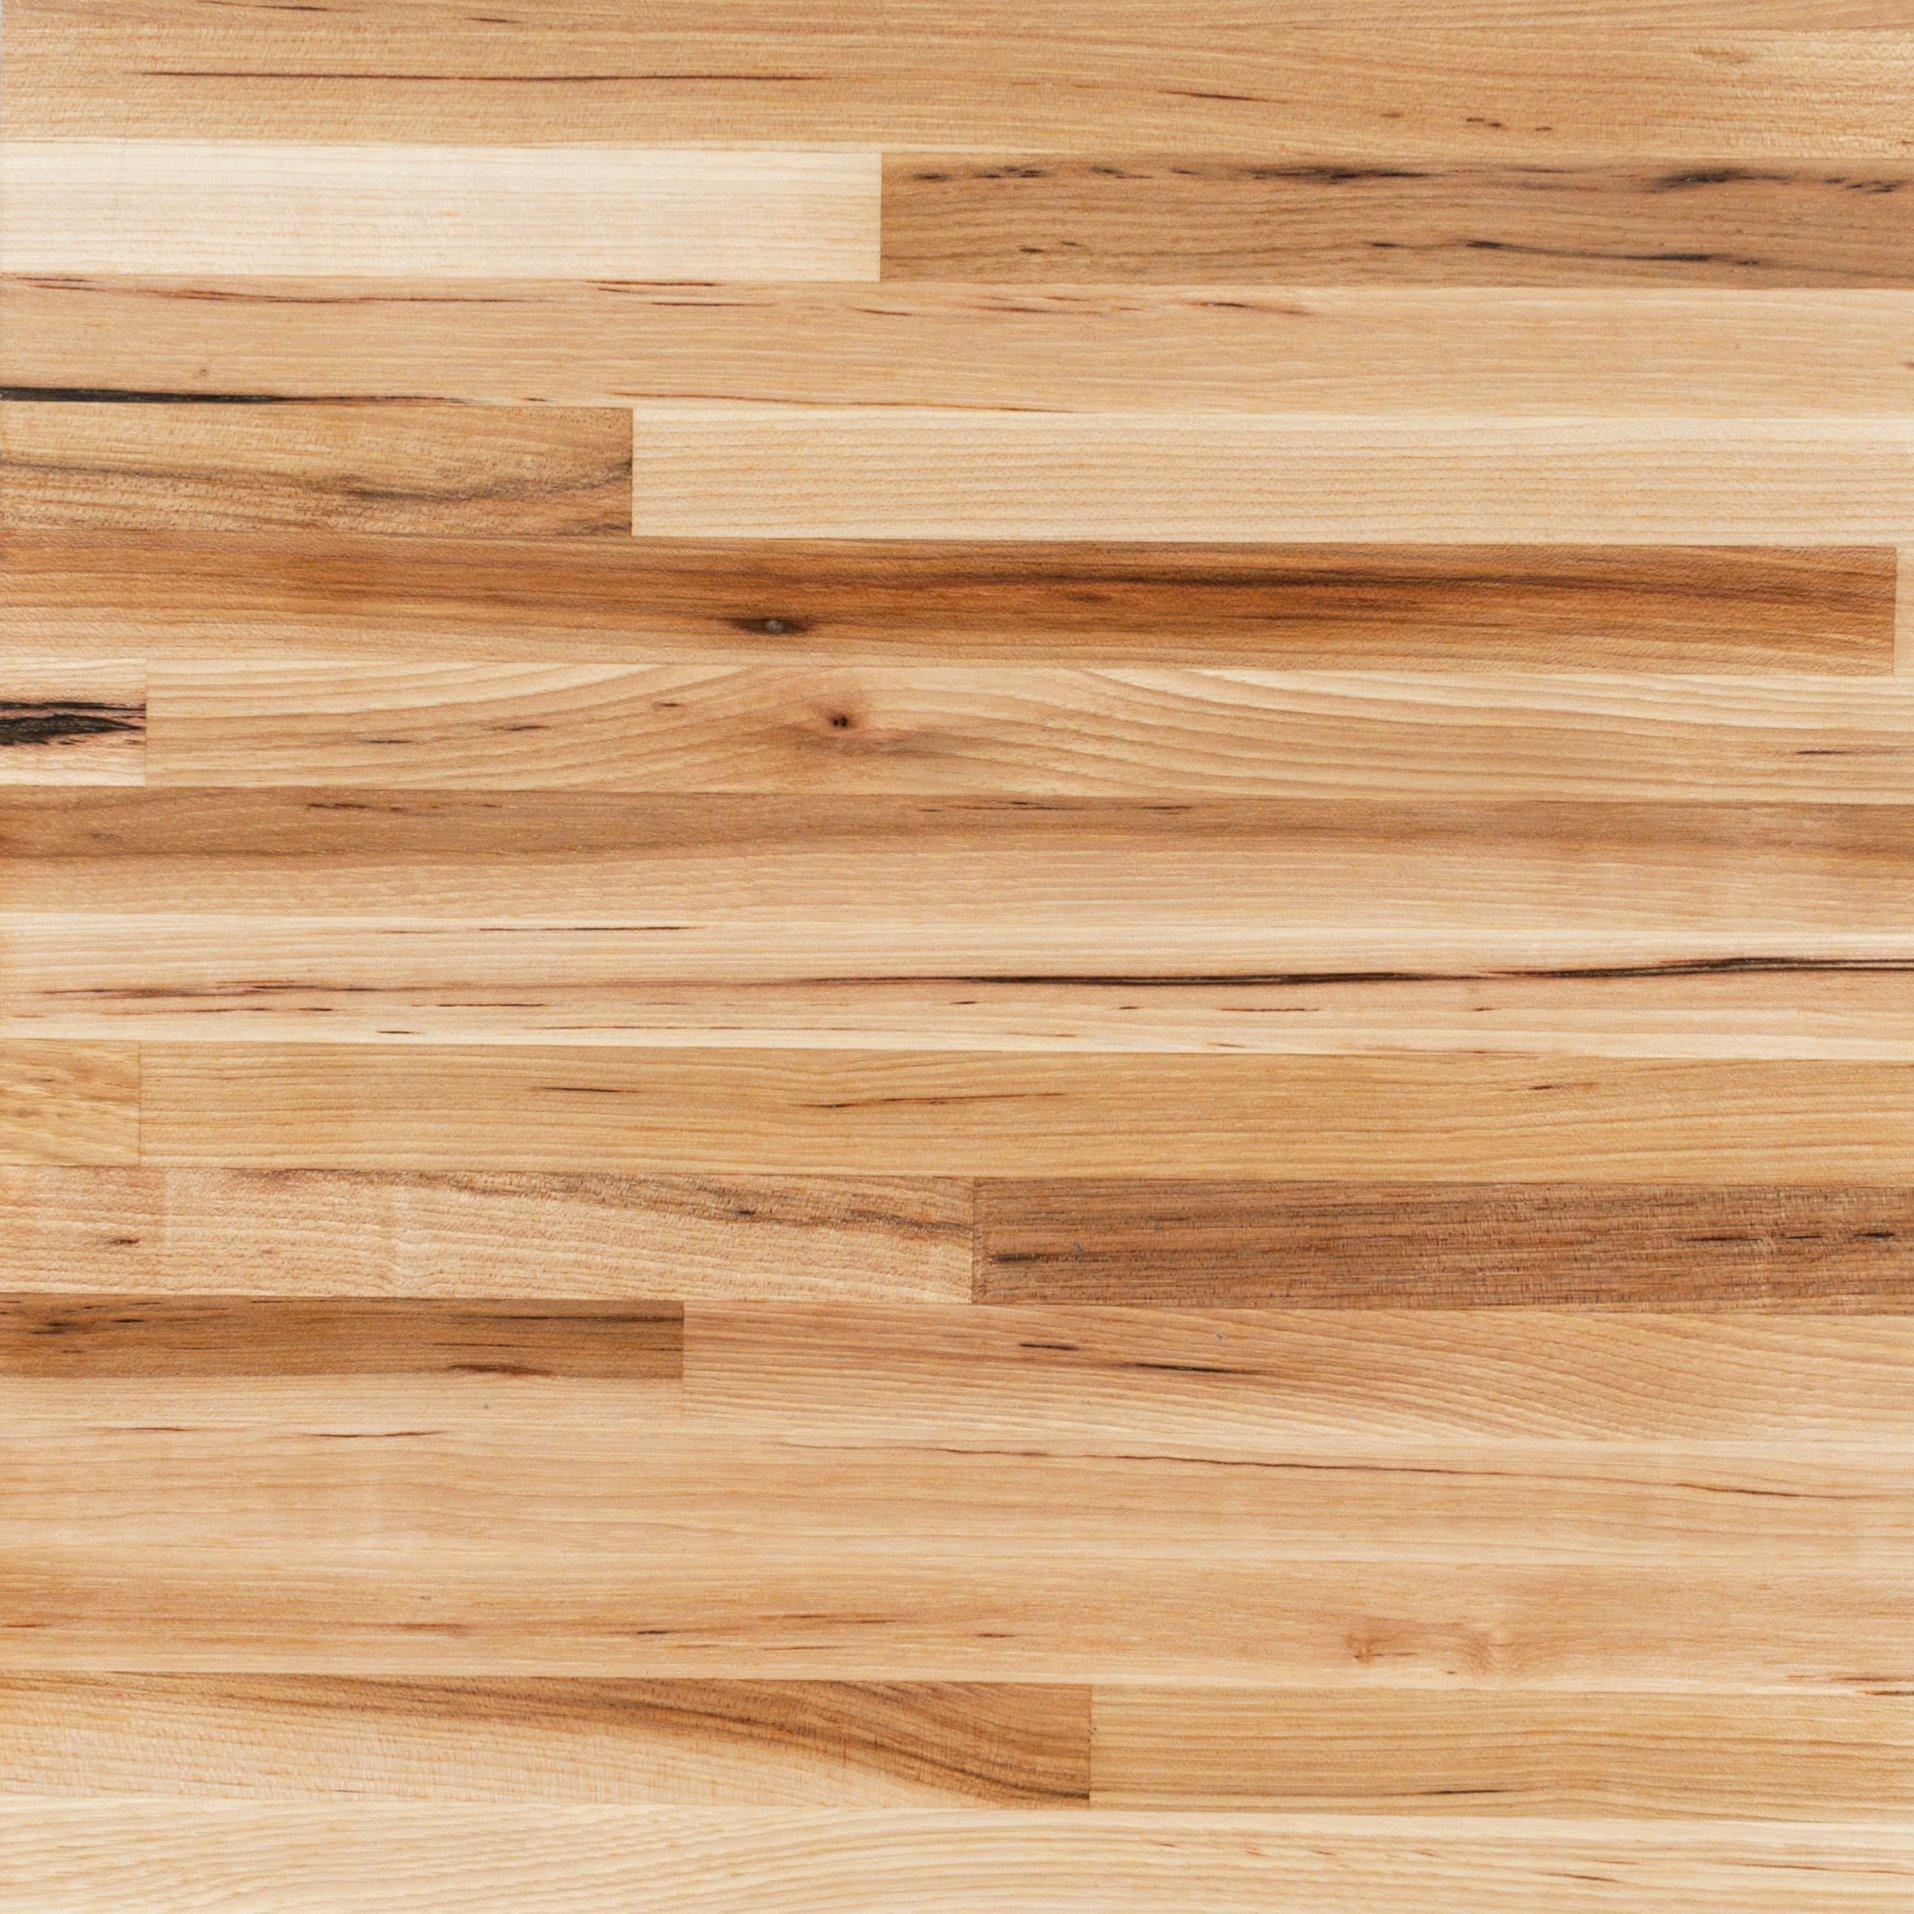 American Hickory Butcher Block Countertop 12ft.   144in. X 25in.    100110121 | Floor And Decor